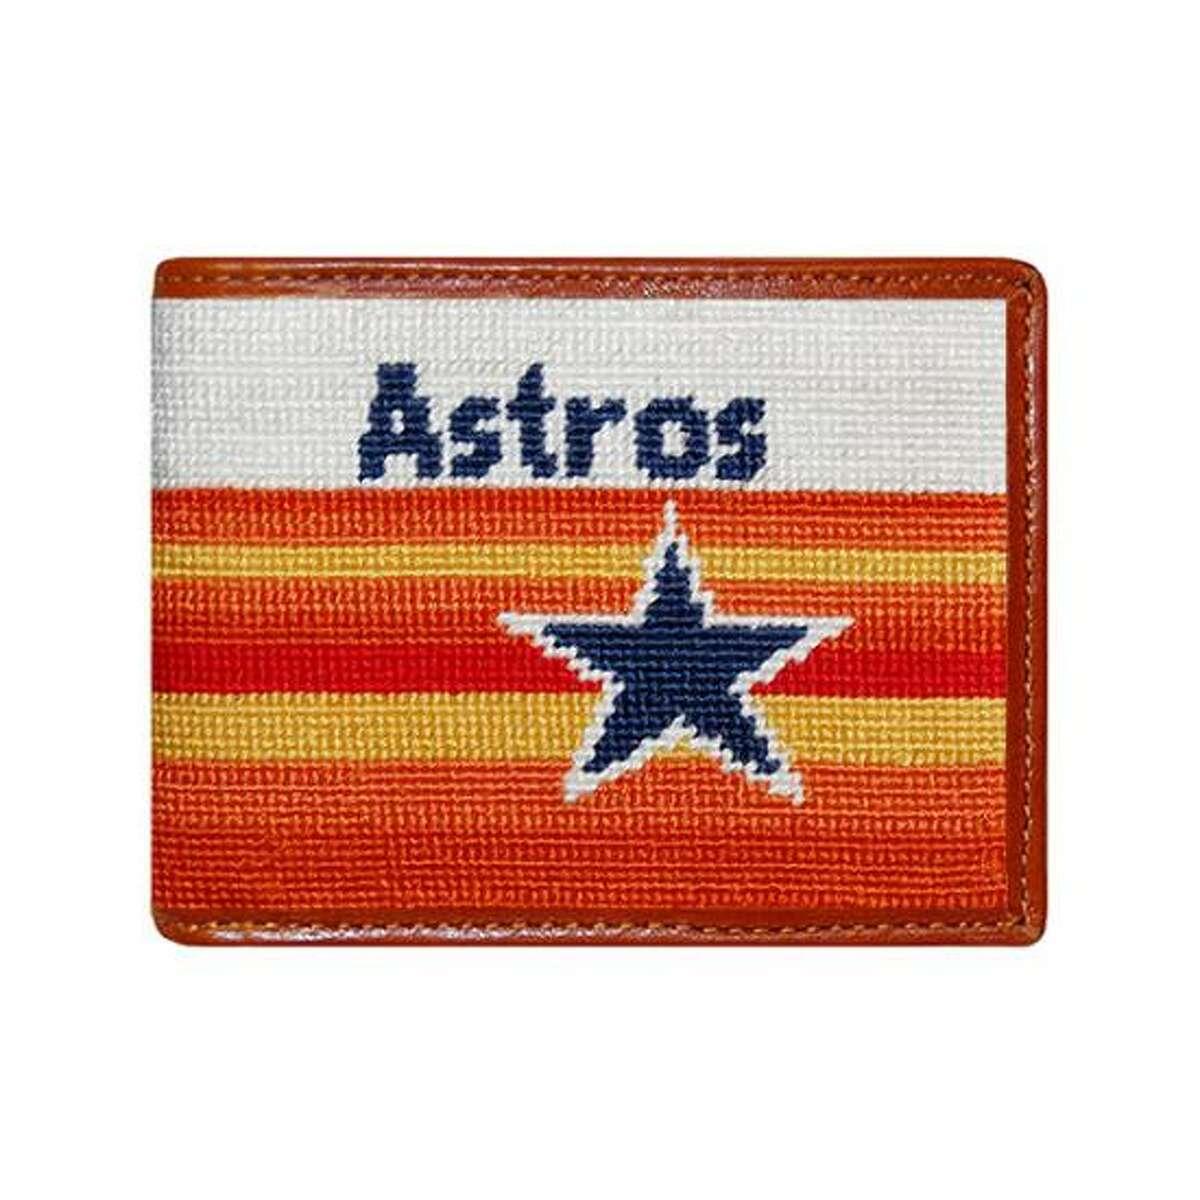 Astros bi-fold wallet; $115 at Paris Texas Apparel Co.